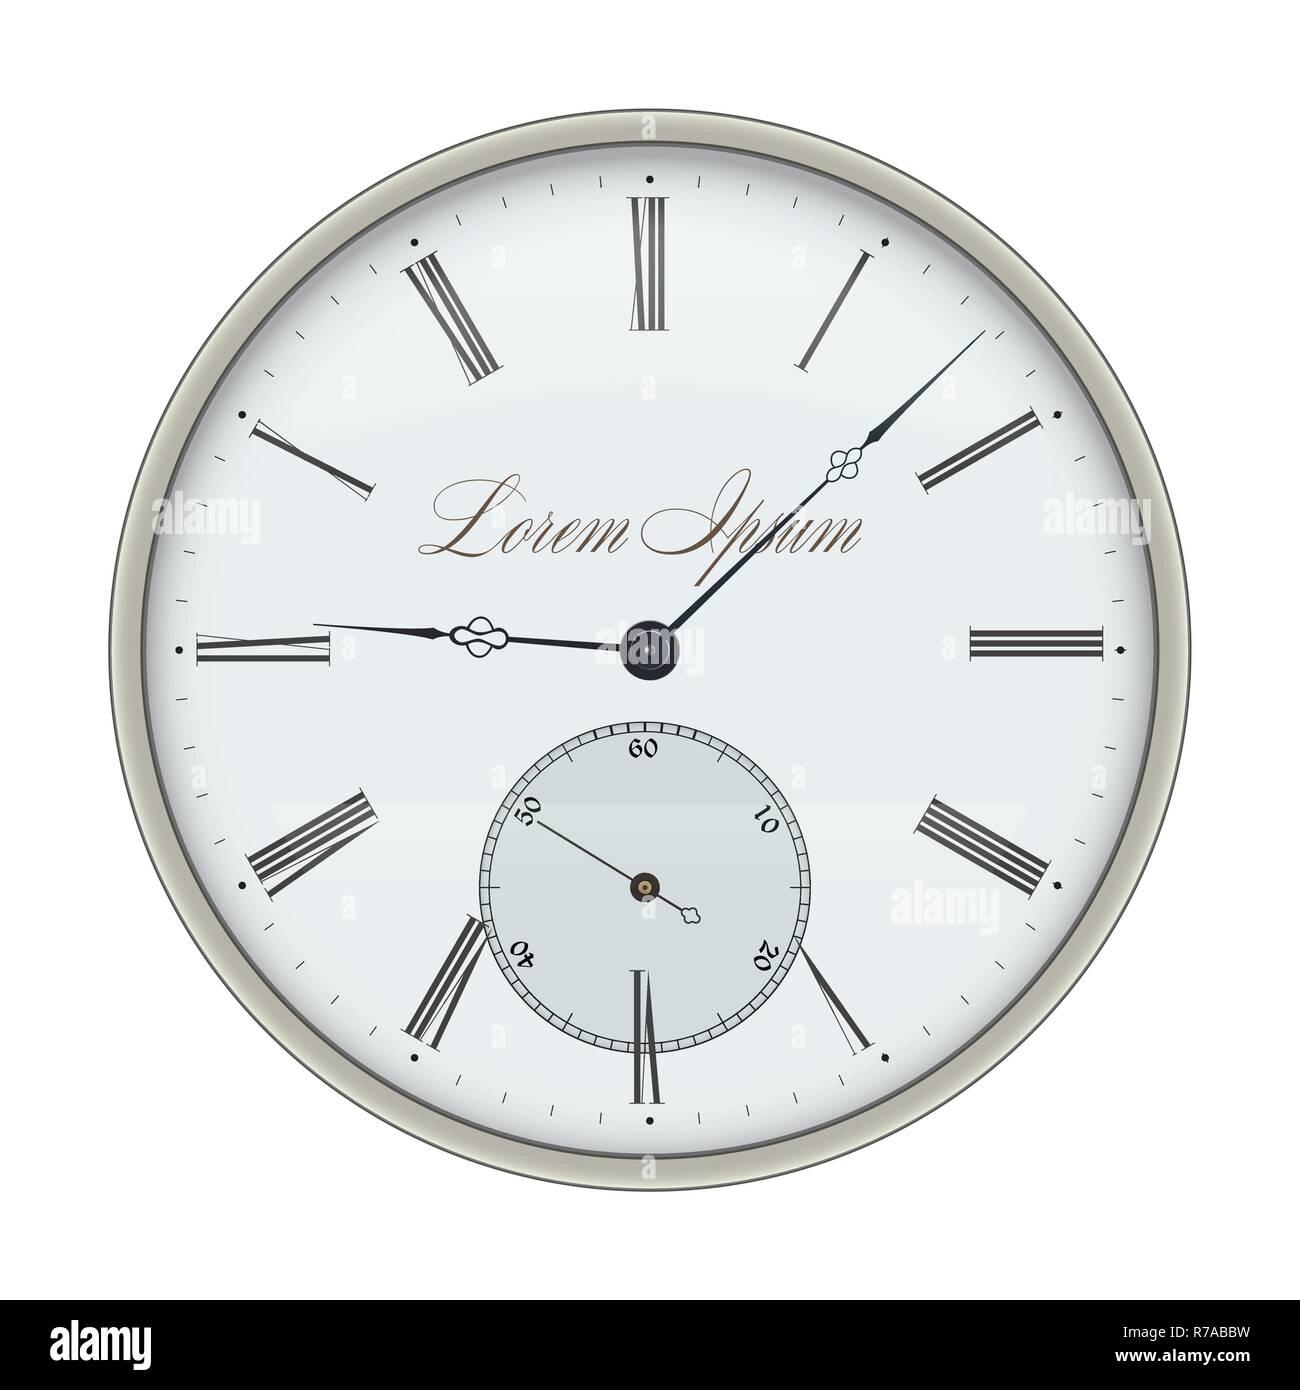 Clock. Vector illustration isolated on white background. - Stock Image